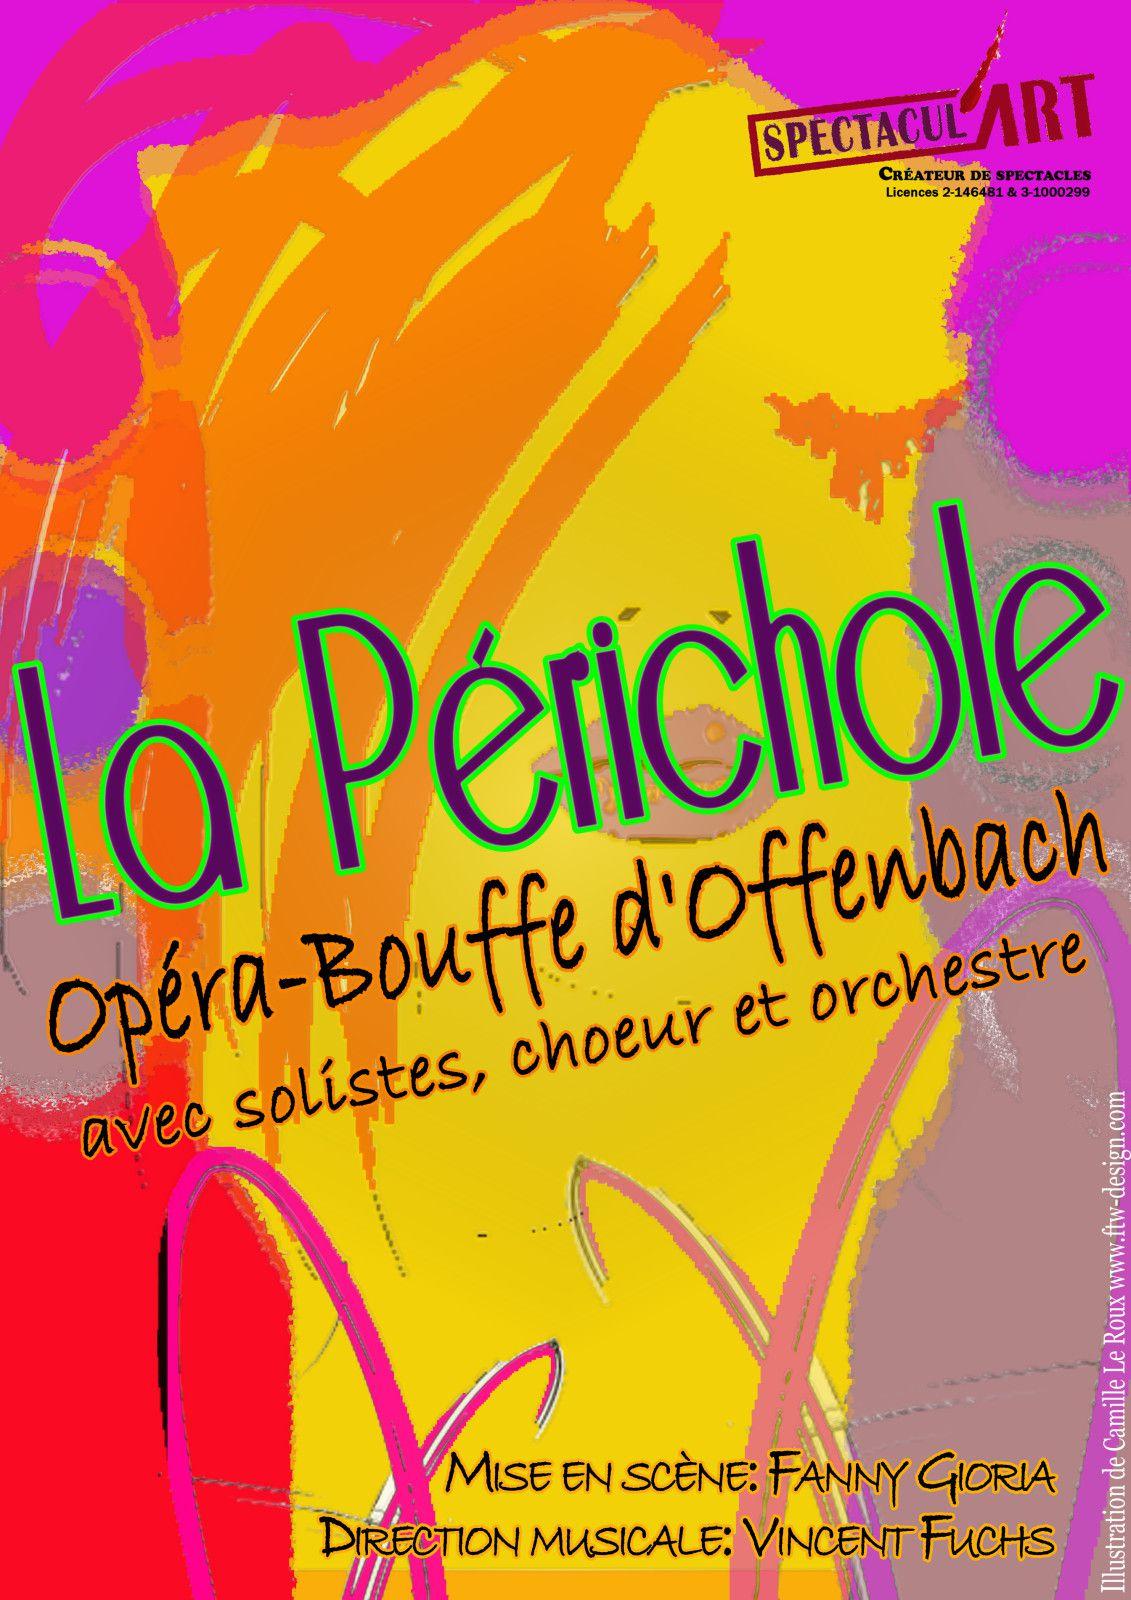 Photos - La Perichole